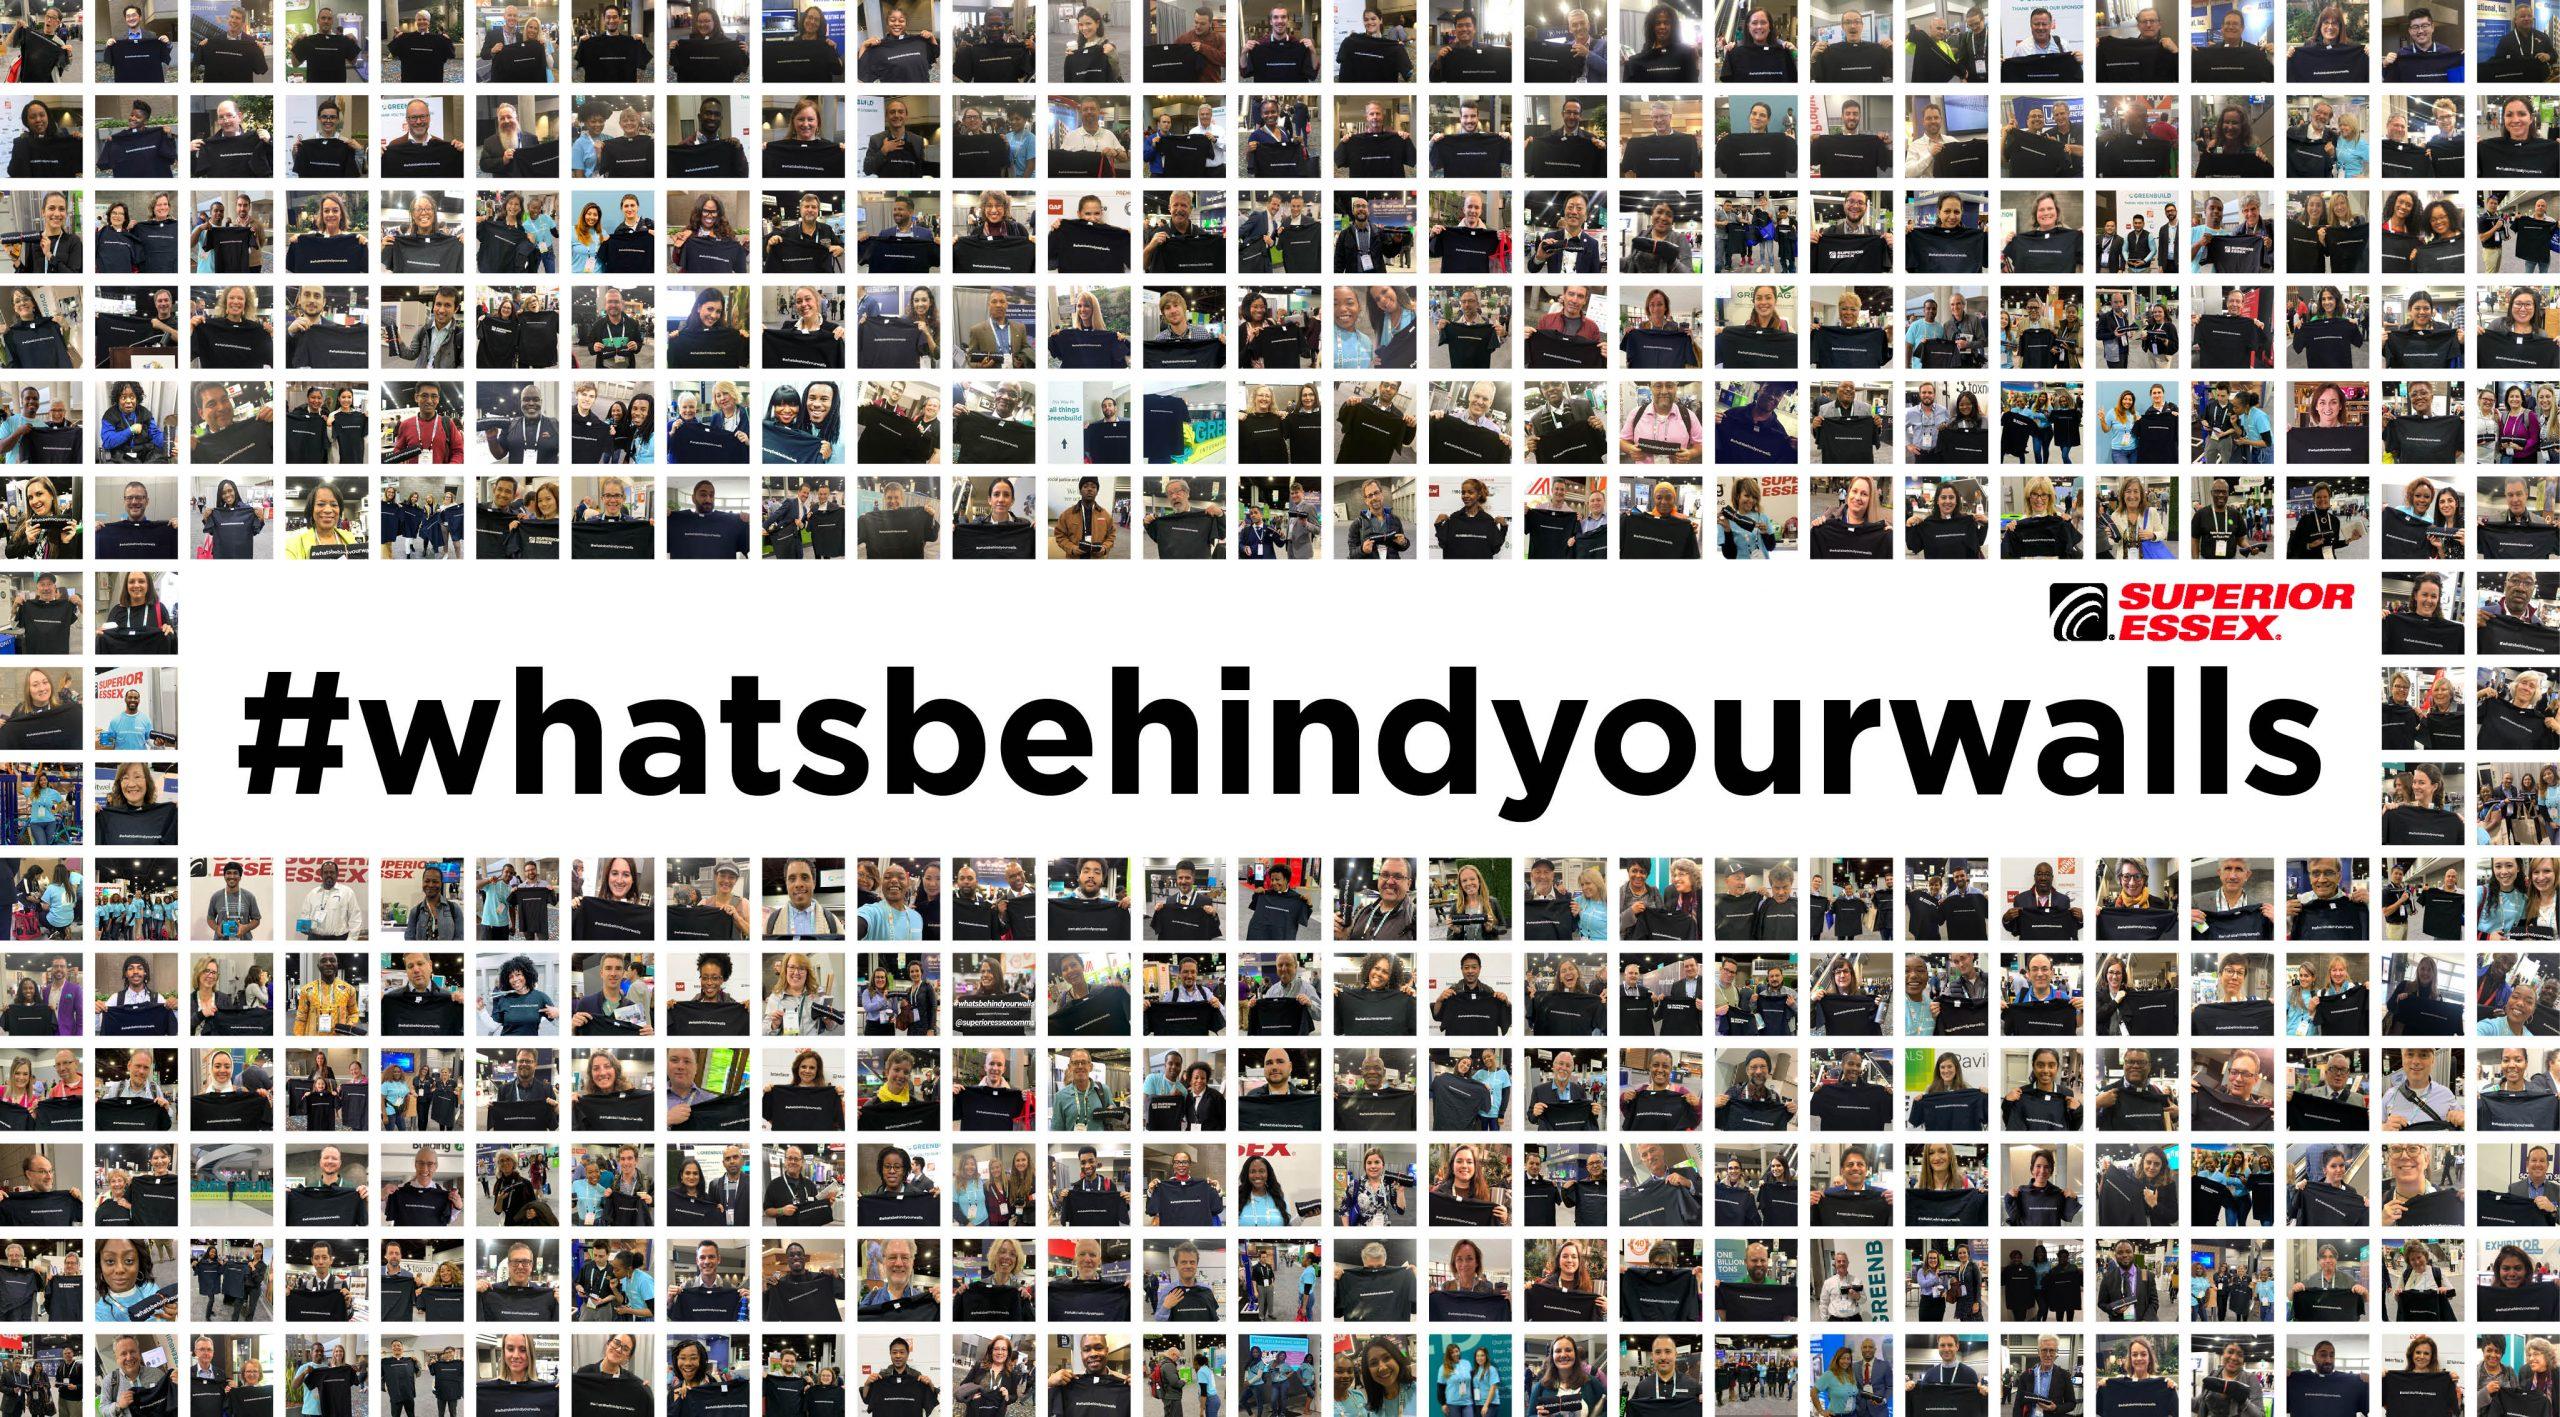 #WhatsBehindYourWalls Campaign